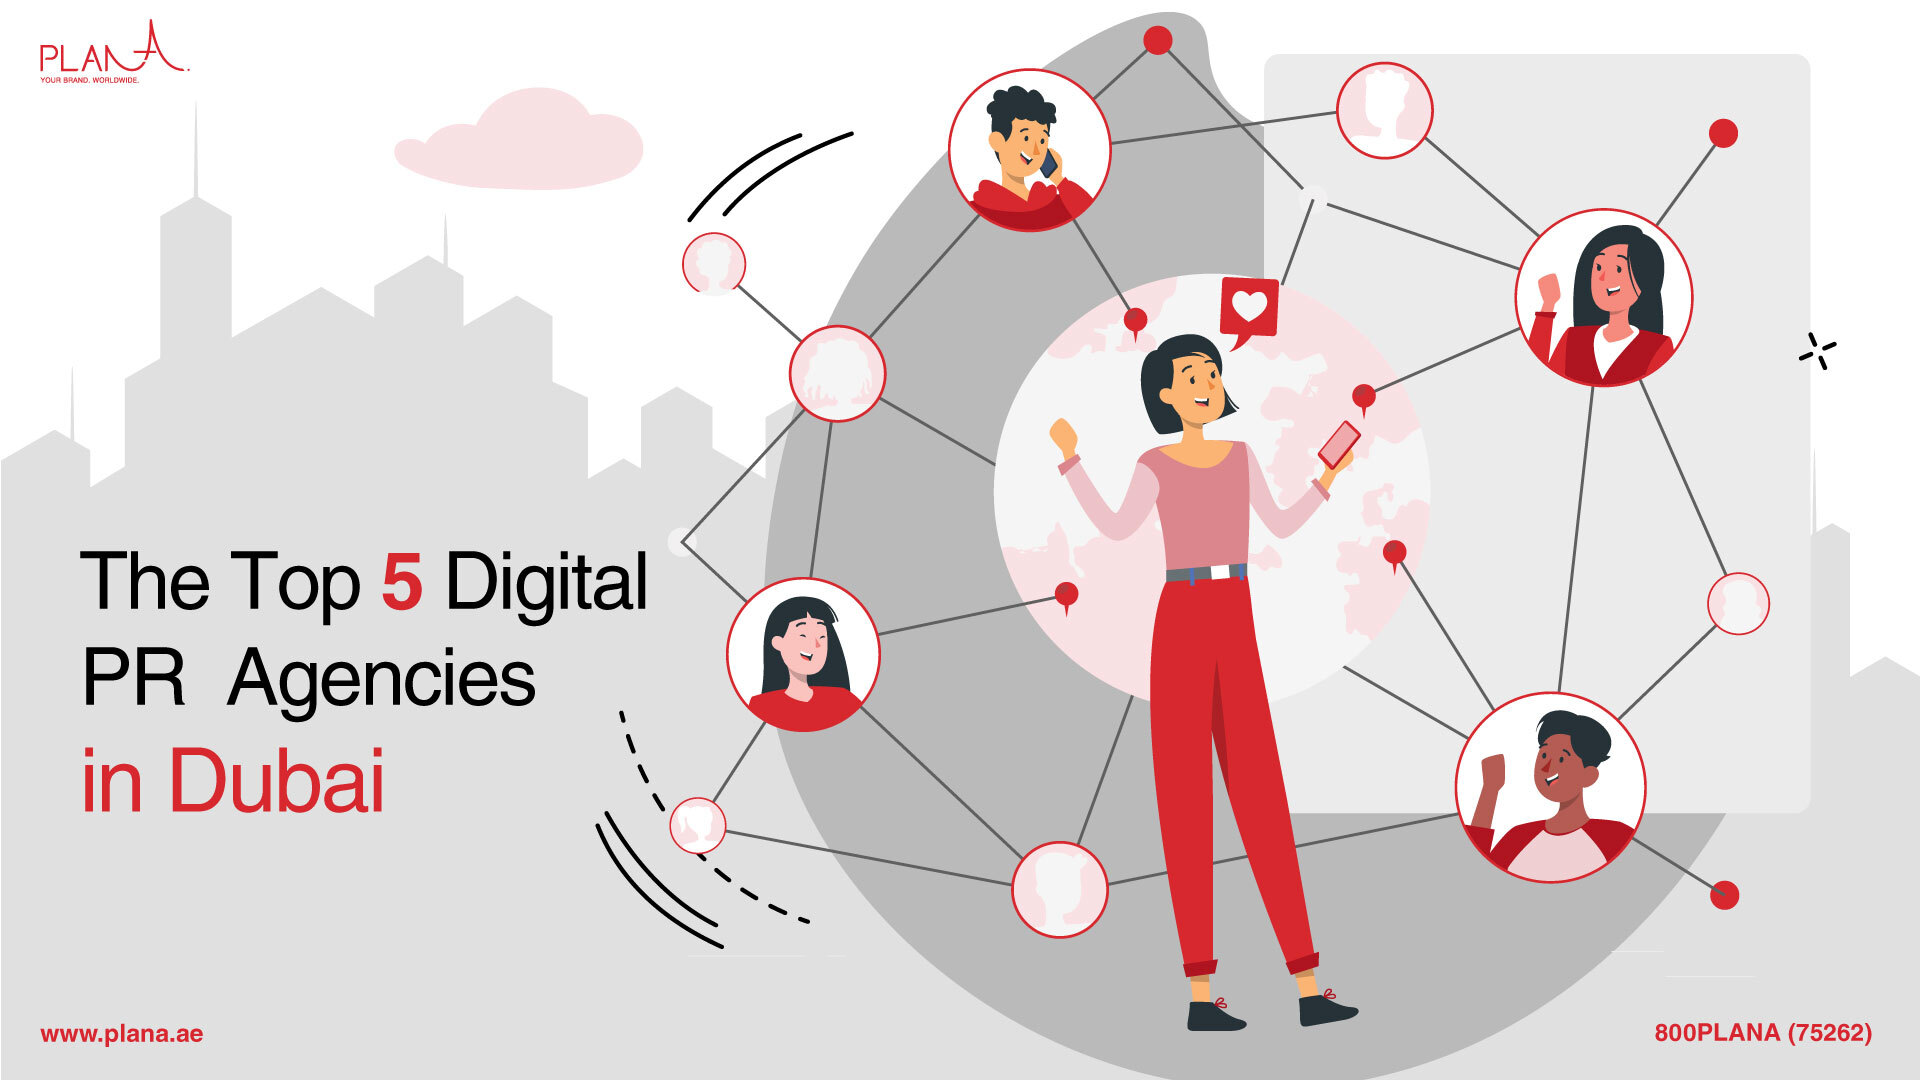 The Top 5 Digital PR Agencies in Dubai